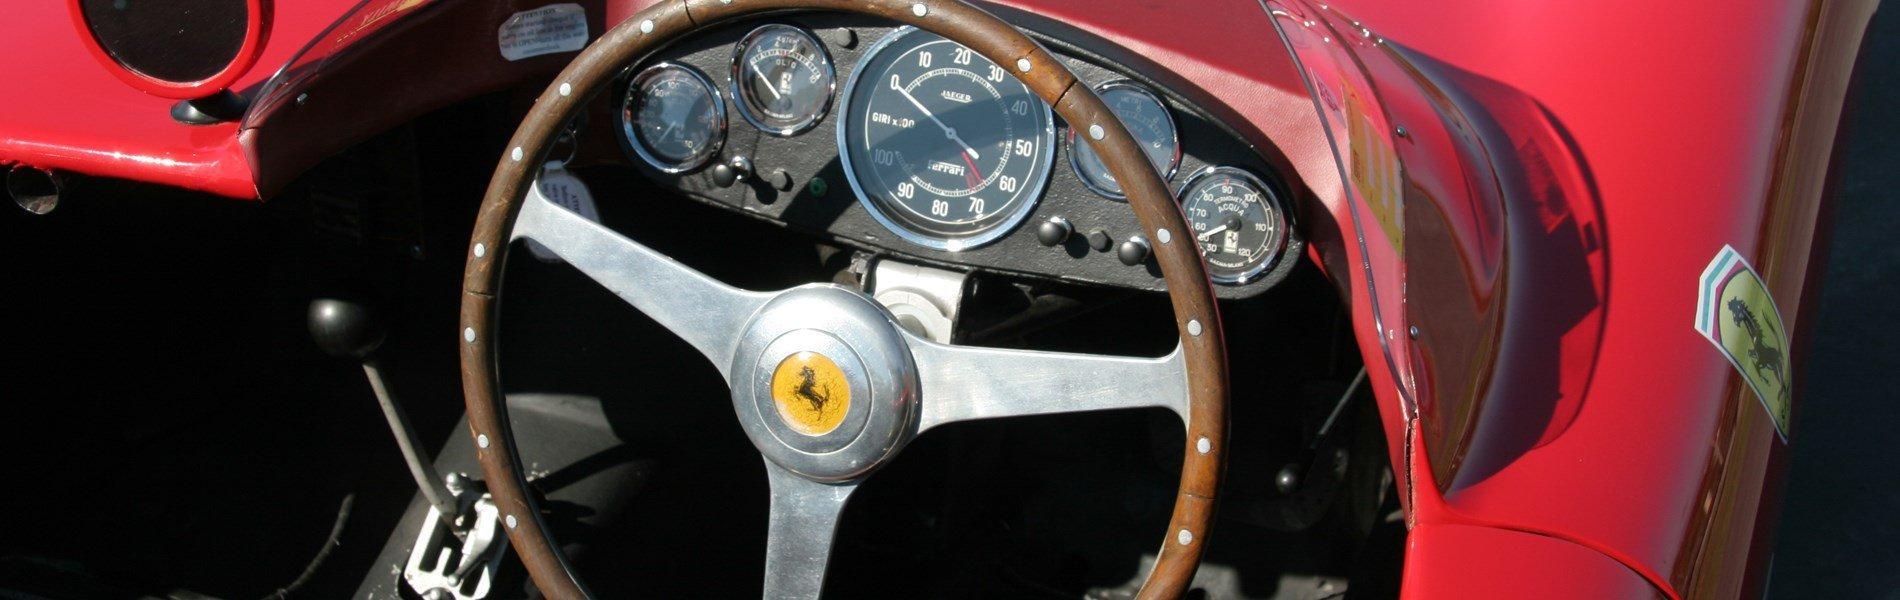 car-appraisal-in-south-florida